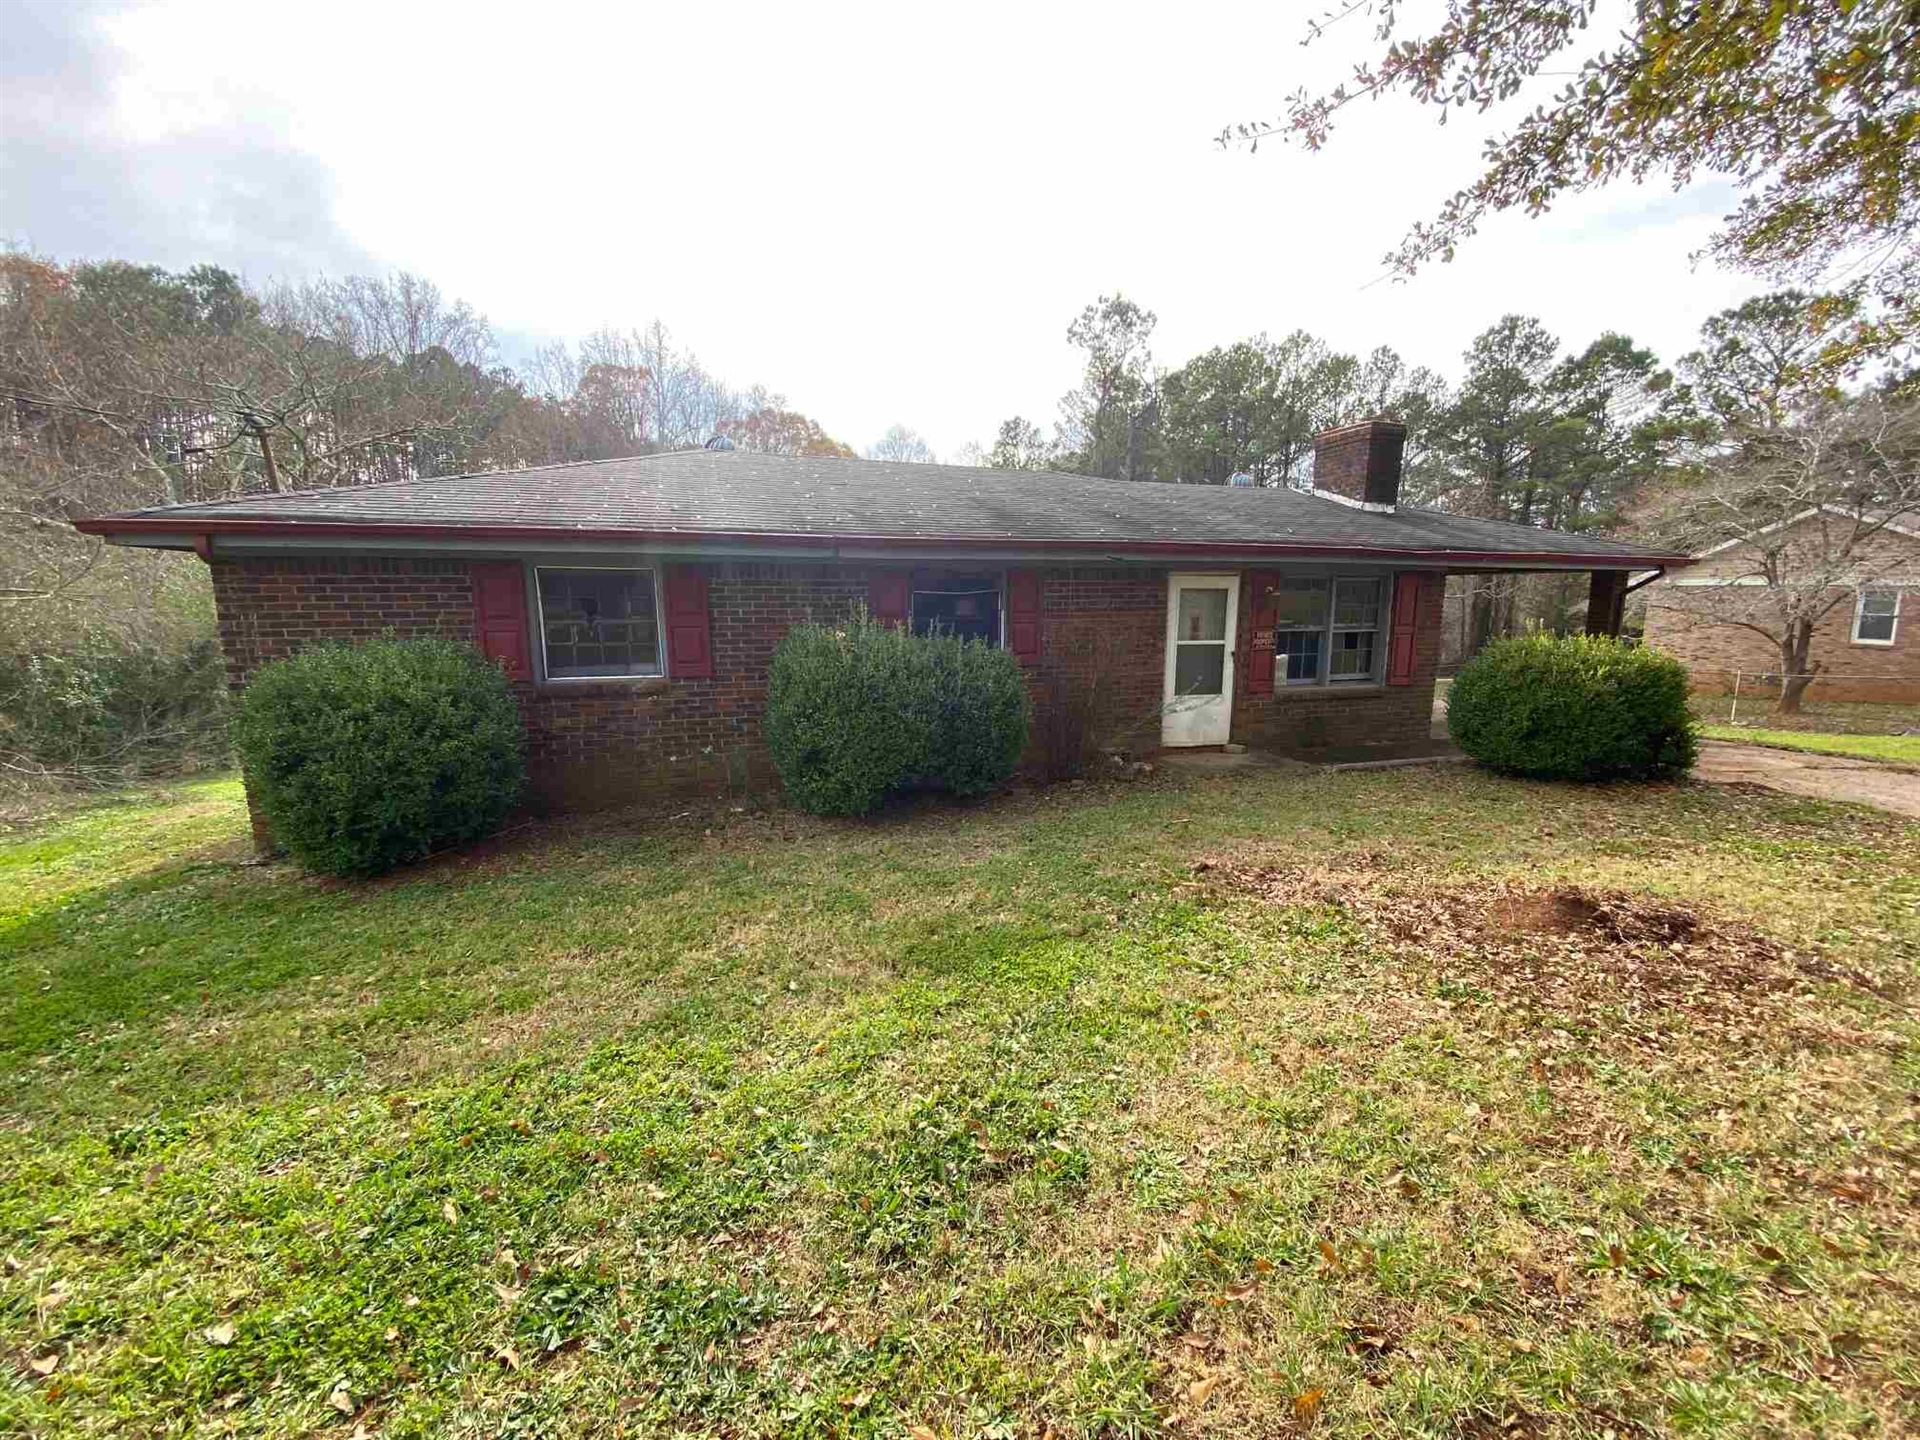 1588 Cochran Ridge Rd, Hiram, GA 30141 - MLS#: 8913960